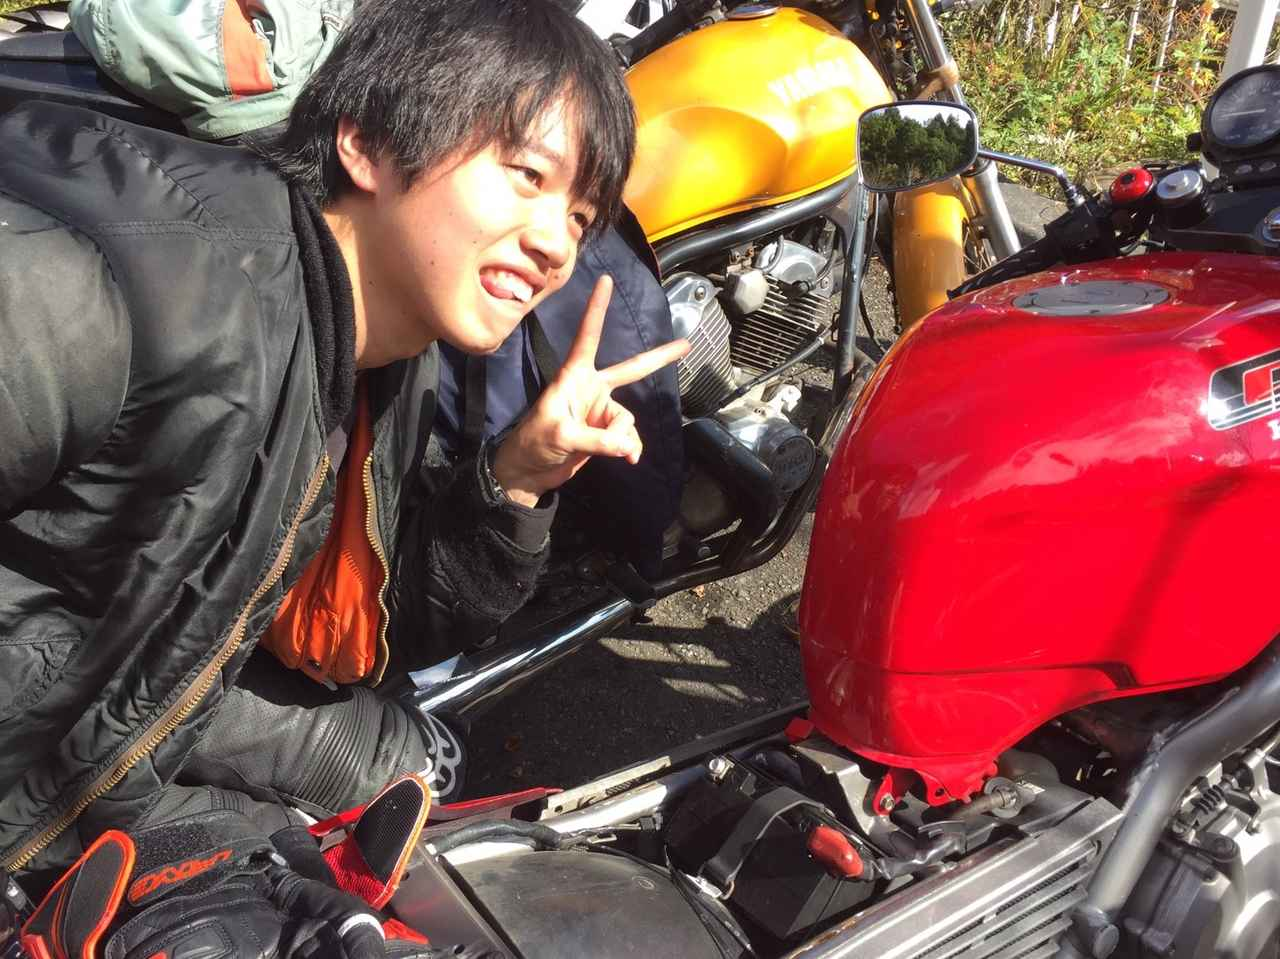 Images : 2番目の画像 - 「初心者多めで、トラブル多数?? 多摩美術大学バイクサークルの『RAC』です!」のアルバム - webオートバイ